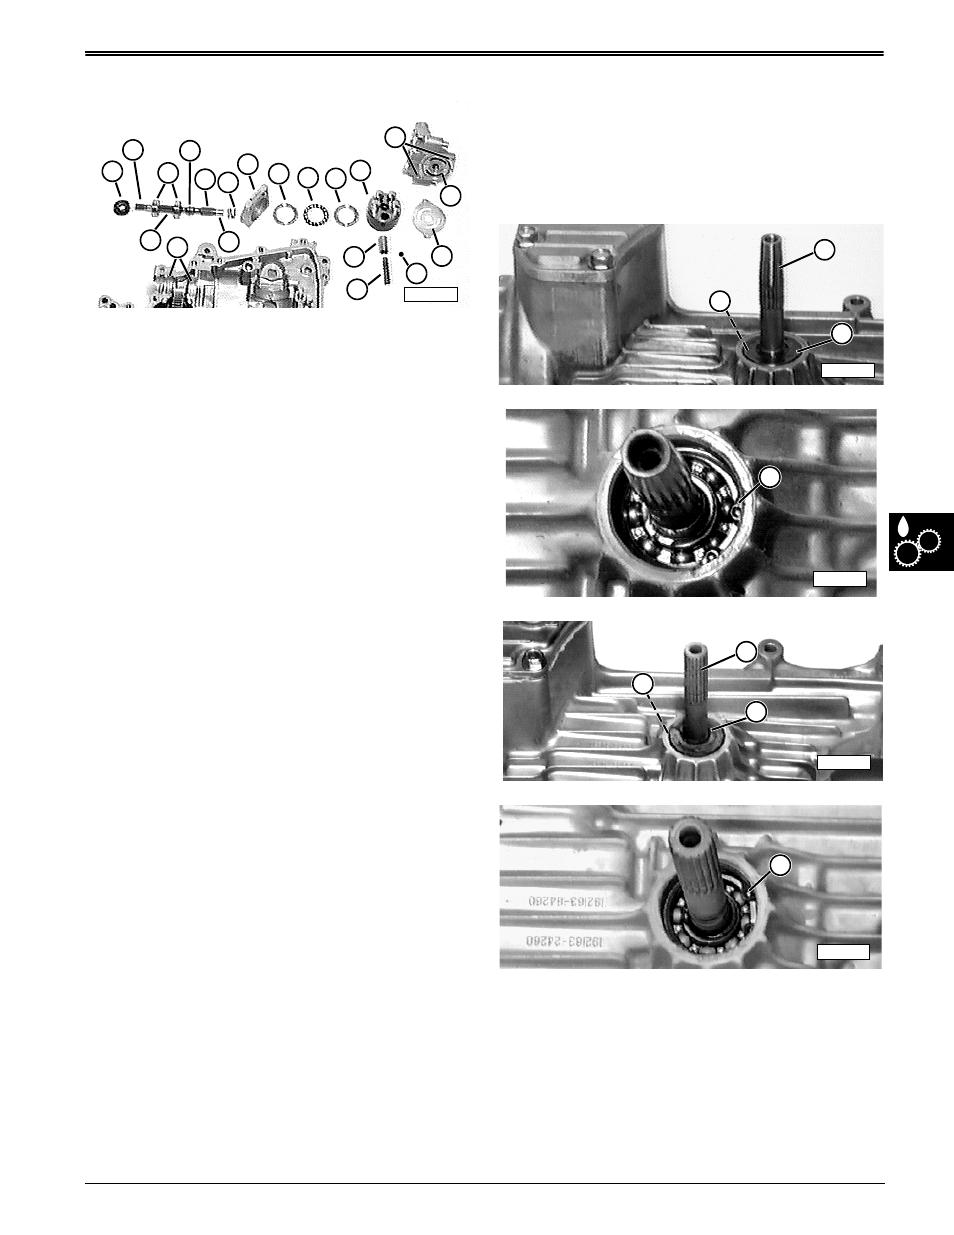 Transaxle assembly, Repair | John Deere stx38 User Manual | Page 273